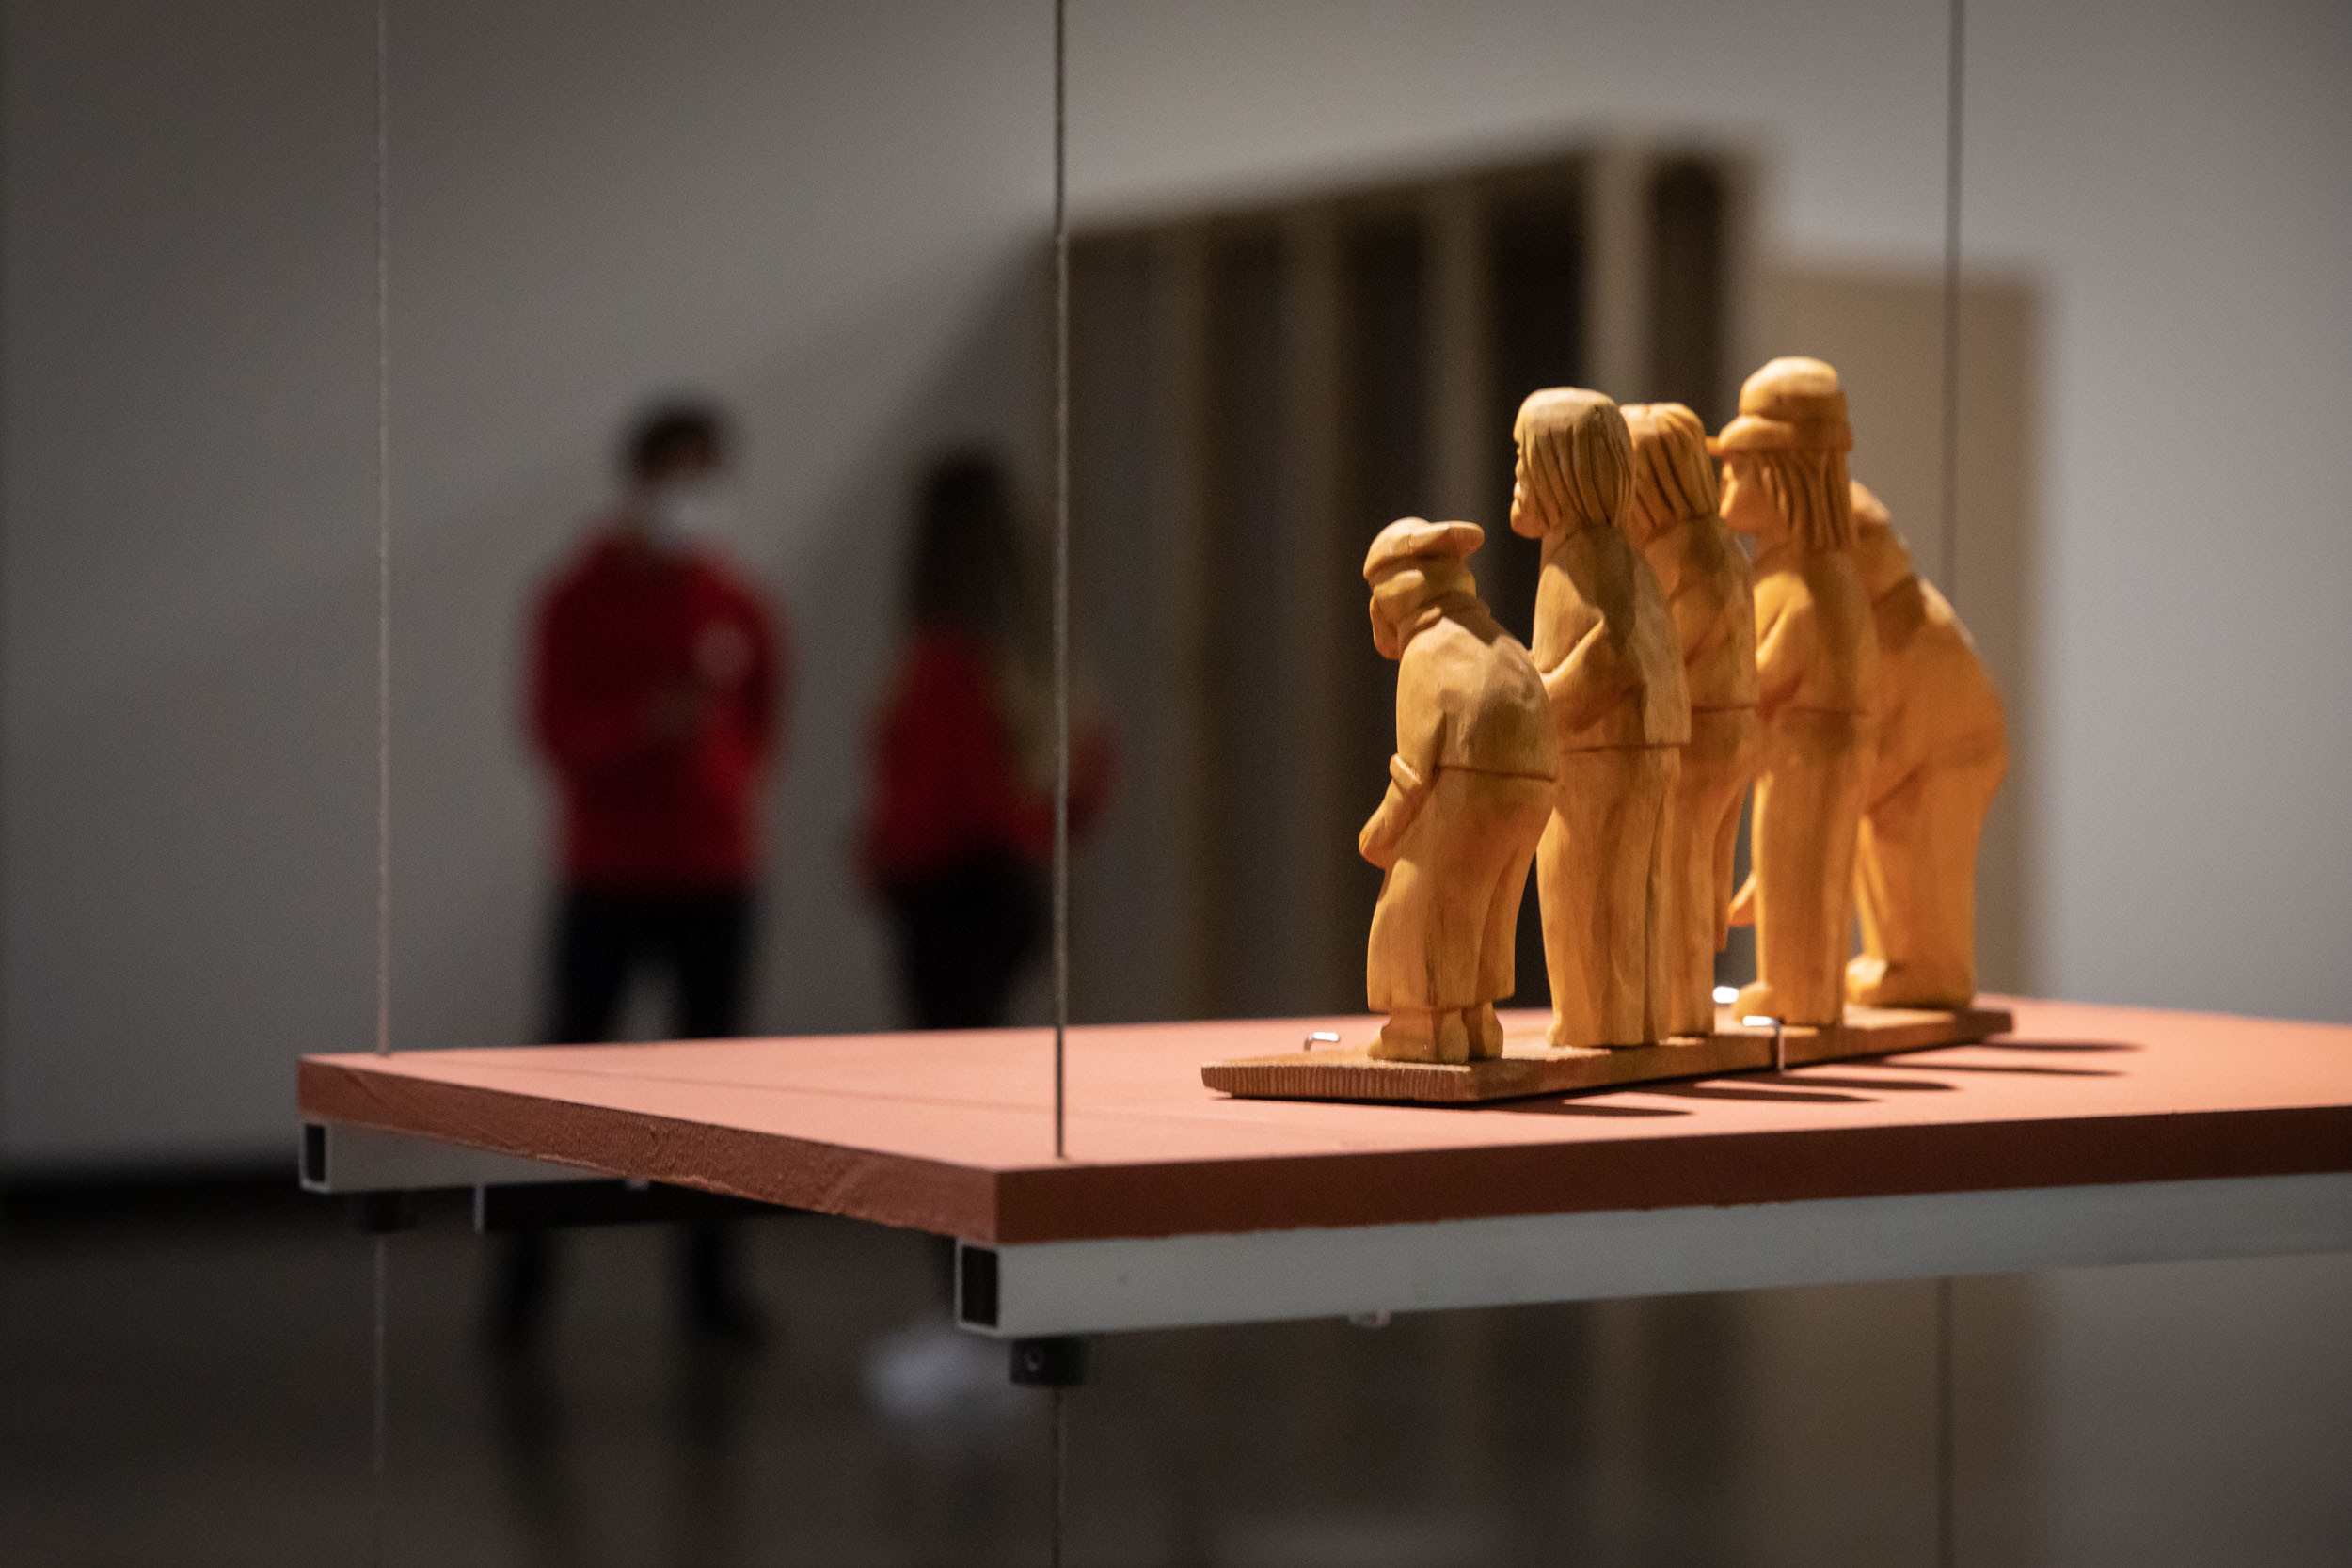 eSeL Foto: Averklub Collective. Manuš heißt Mensch (Kunsthalle Wien, 2.6. - 5.9.2021)